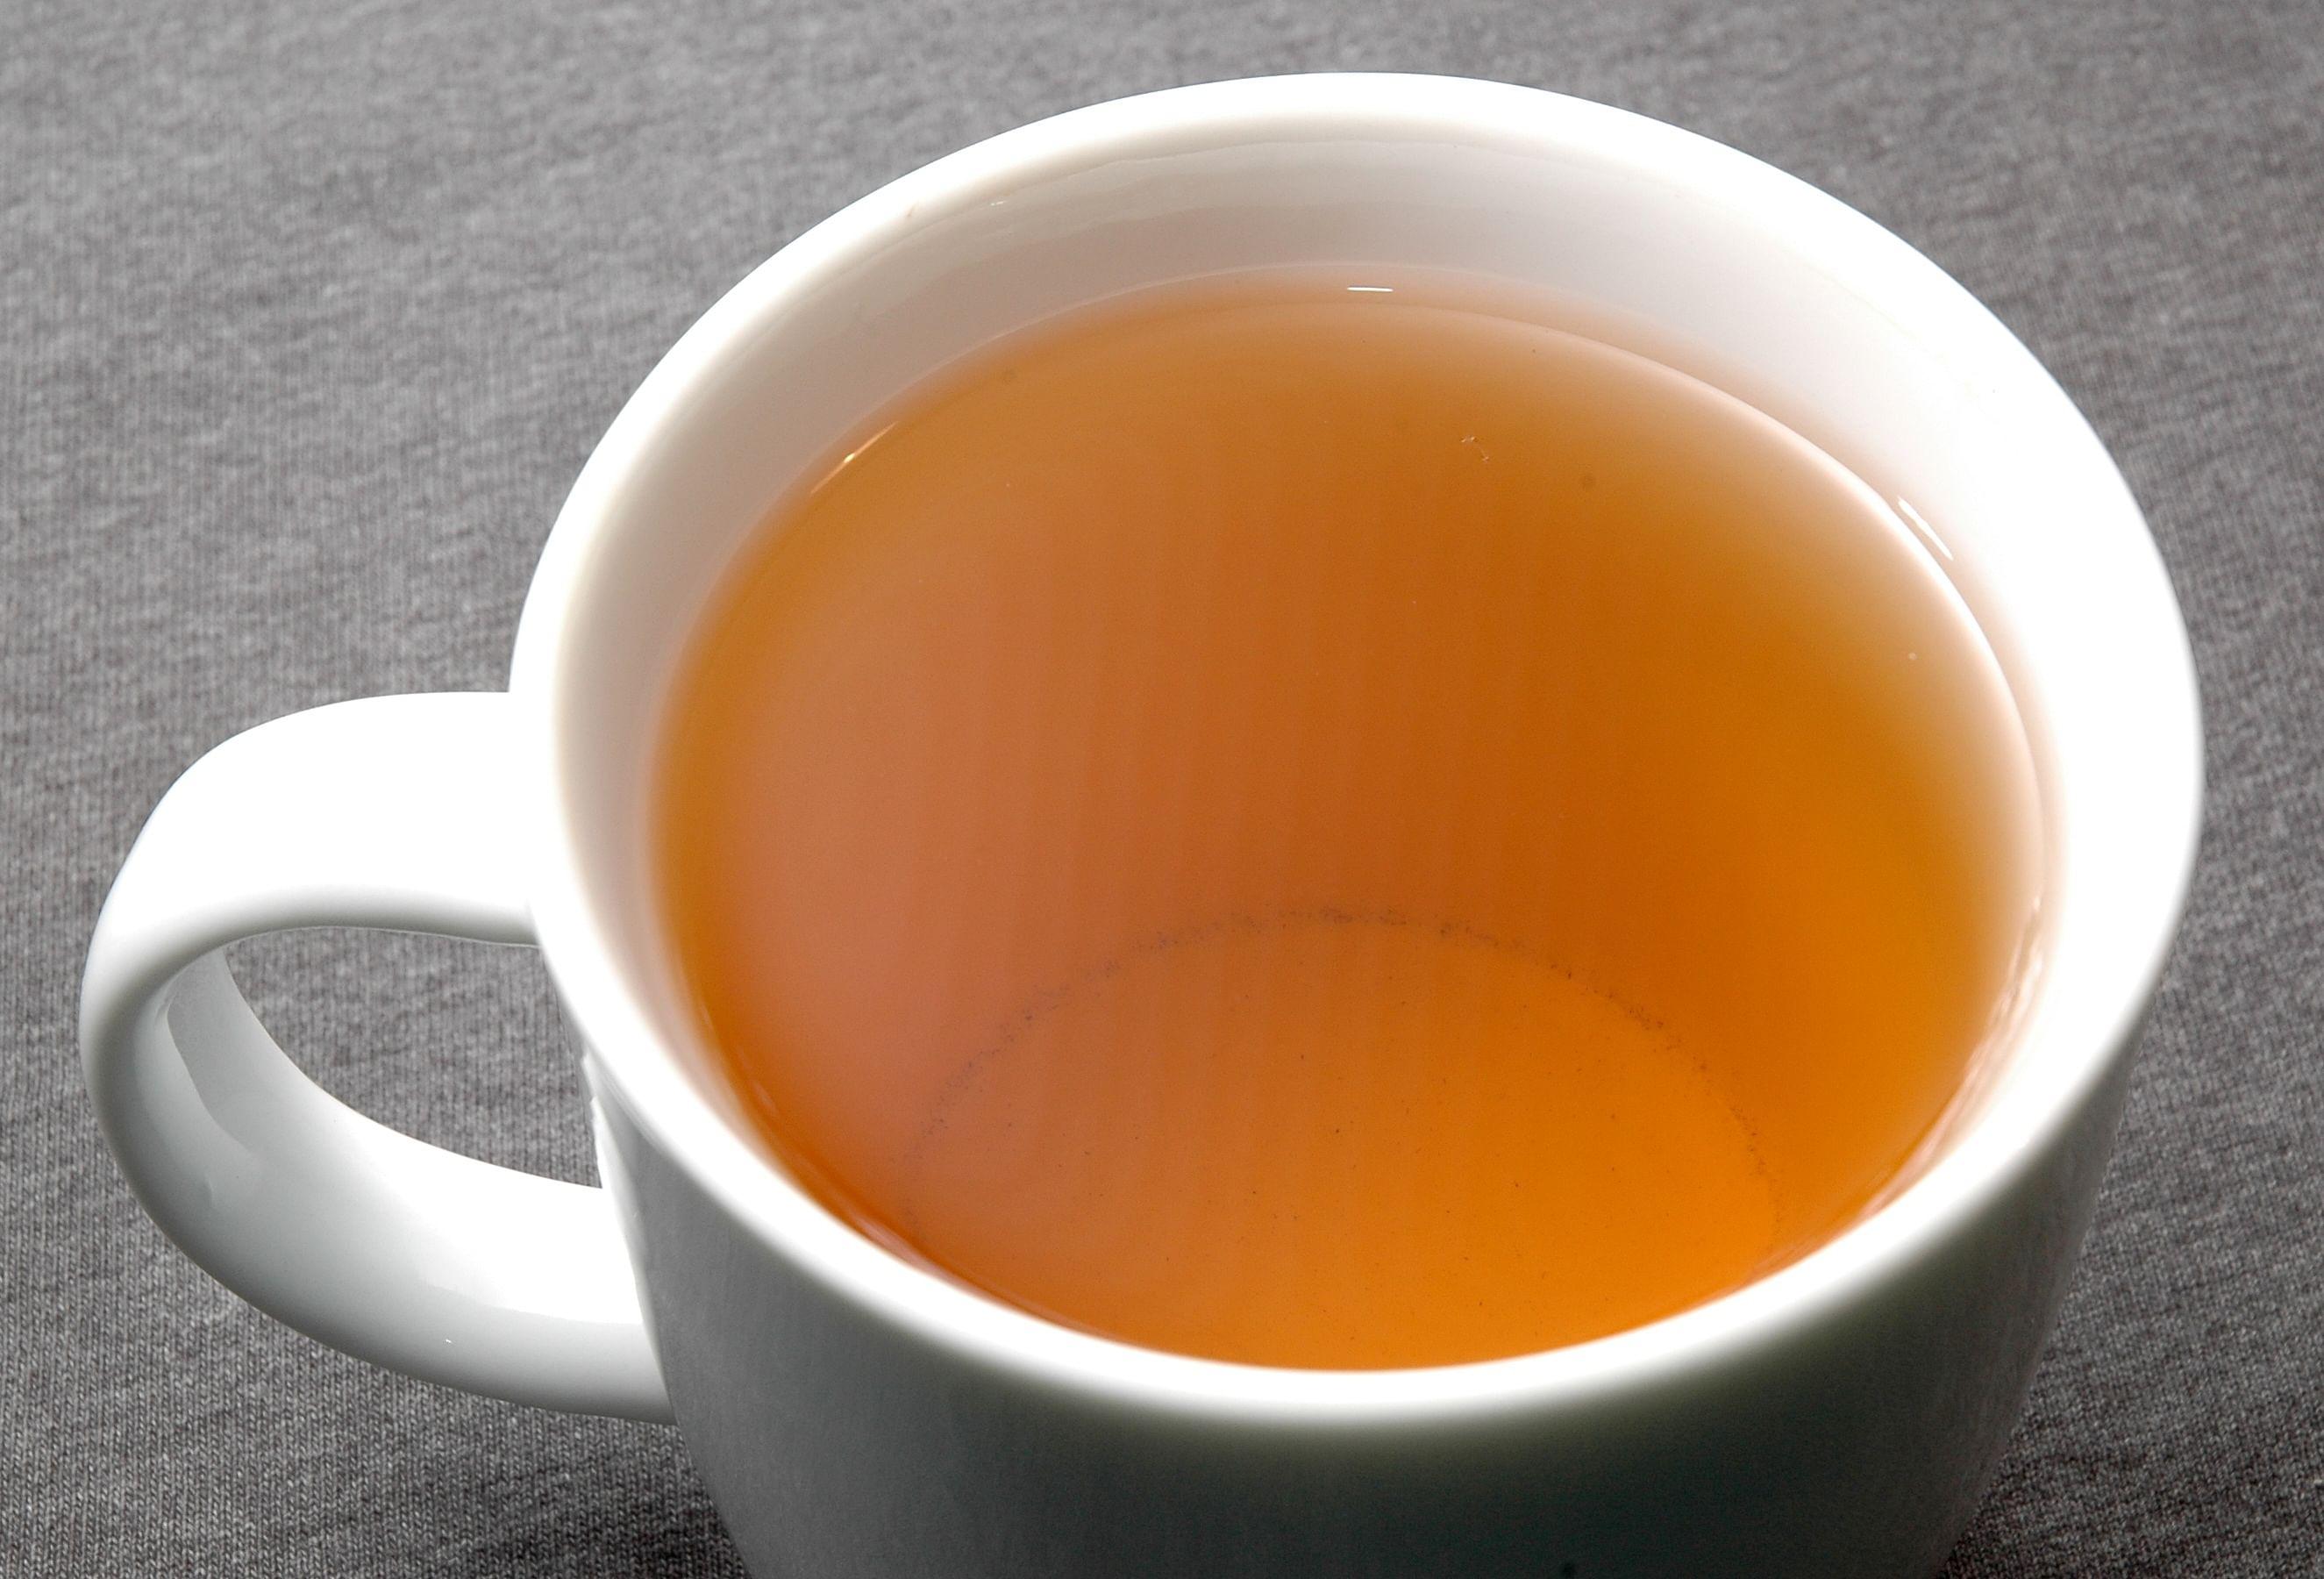 Darjeeling-tea-first-flush-in-cup